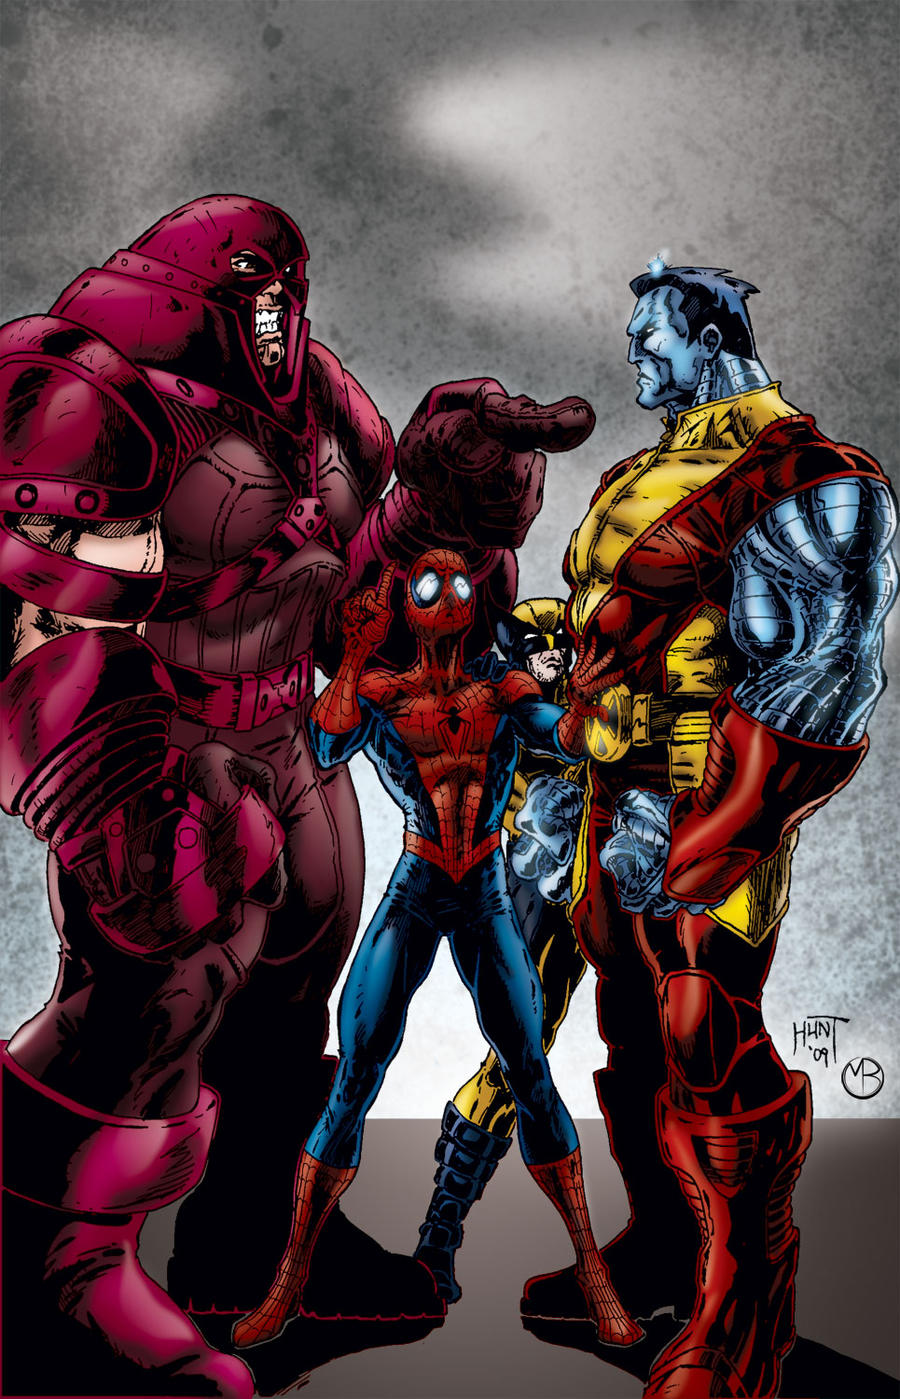 colossus marvel x men - photo #47